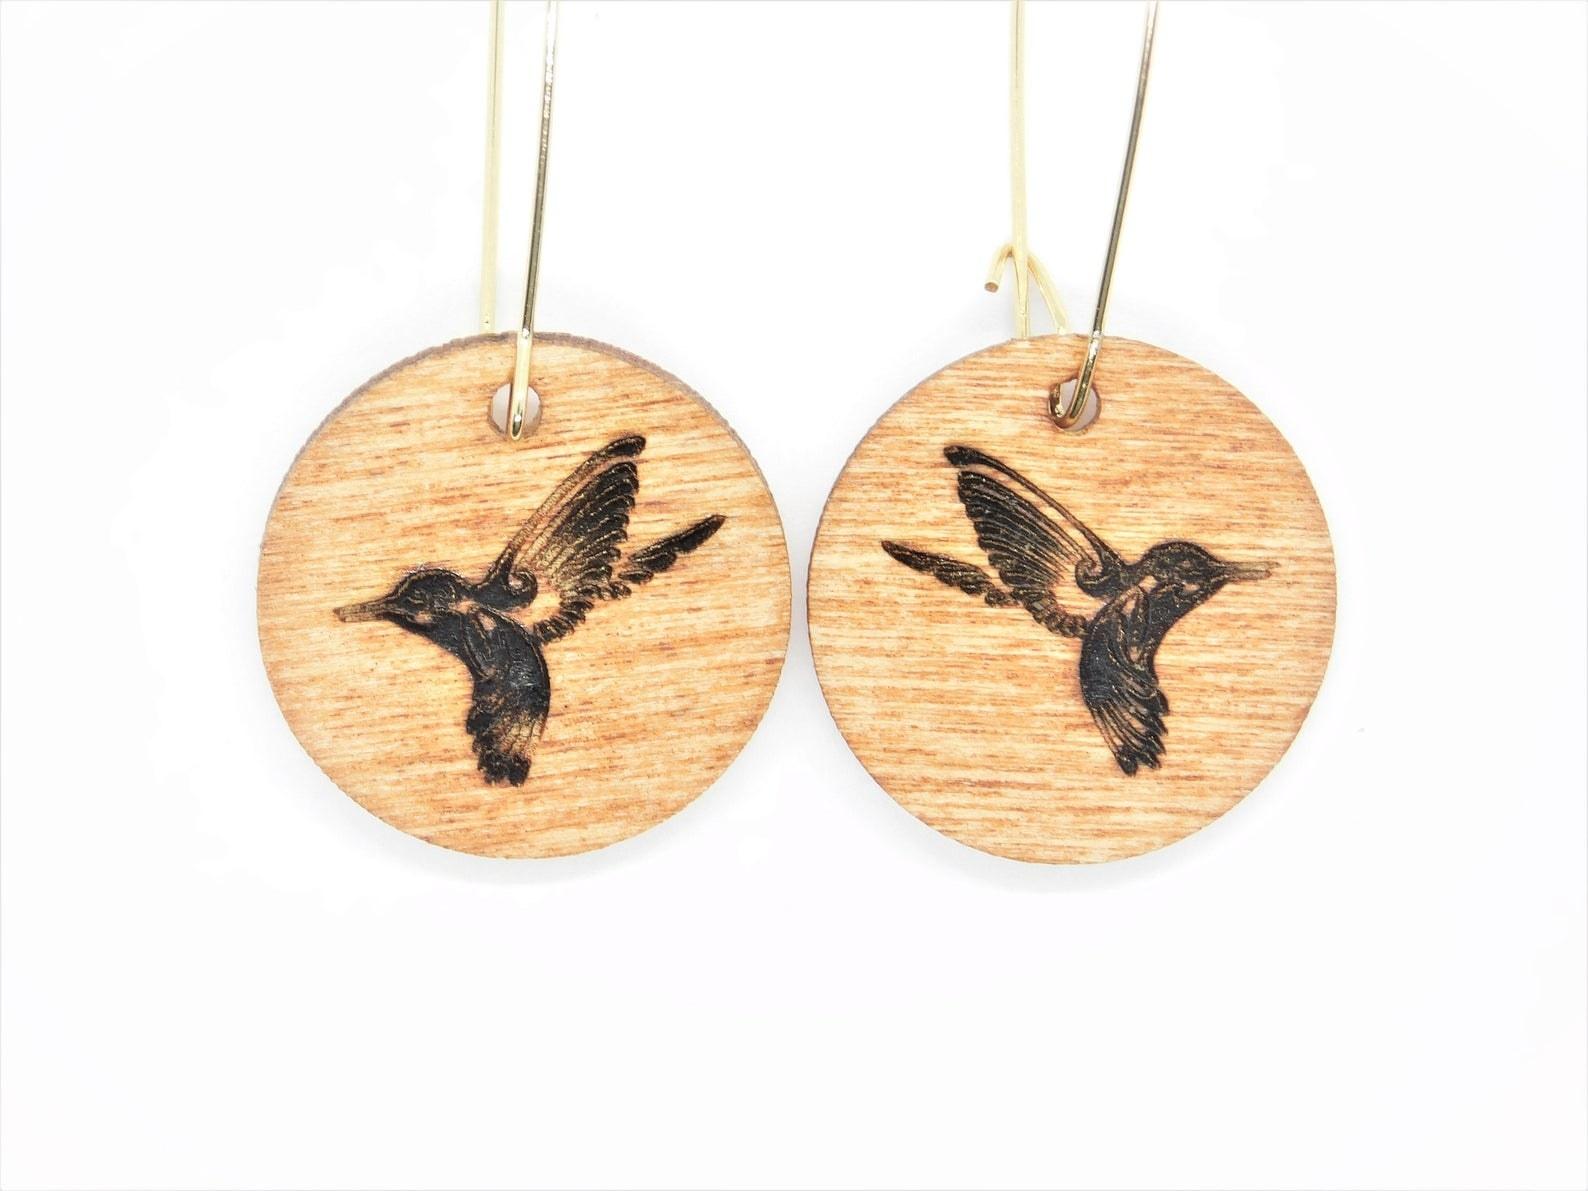 Closeup of two wooden hummingbird earrings